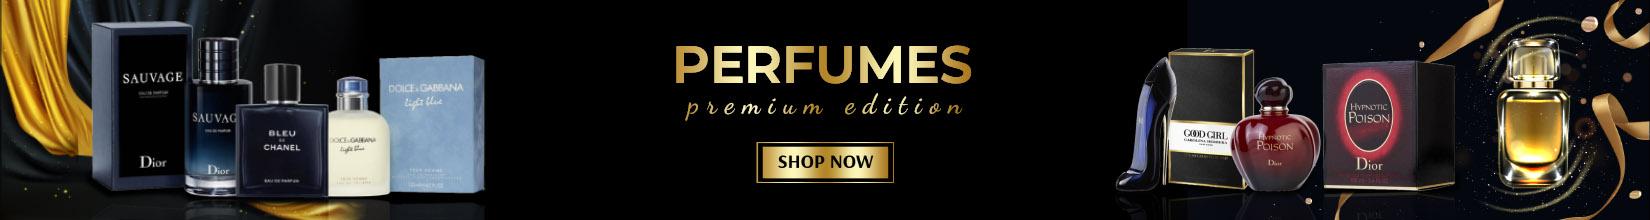 Buy genuine and premium perfumes for both men and women at Choicemandu Online Shopping